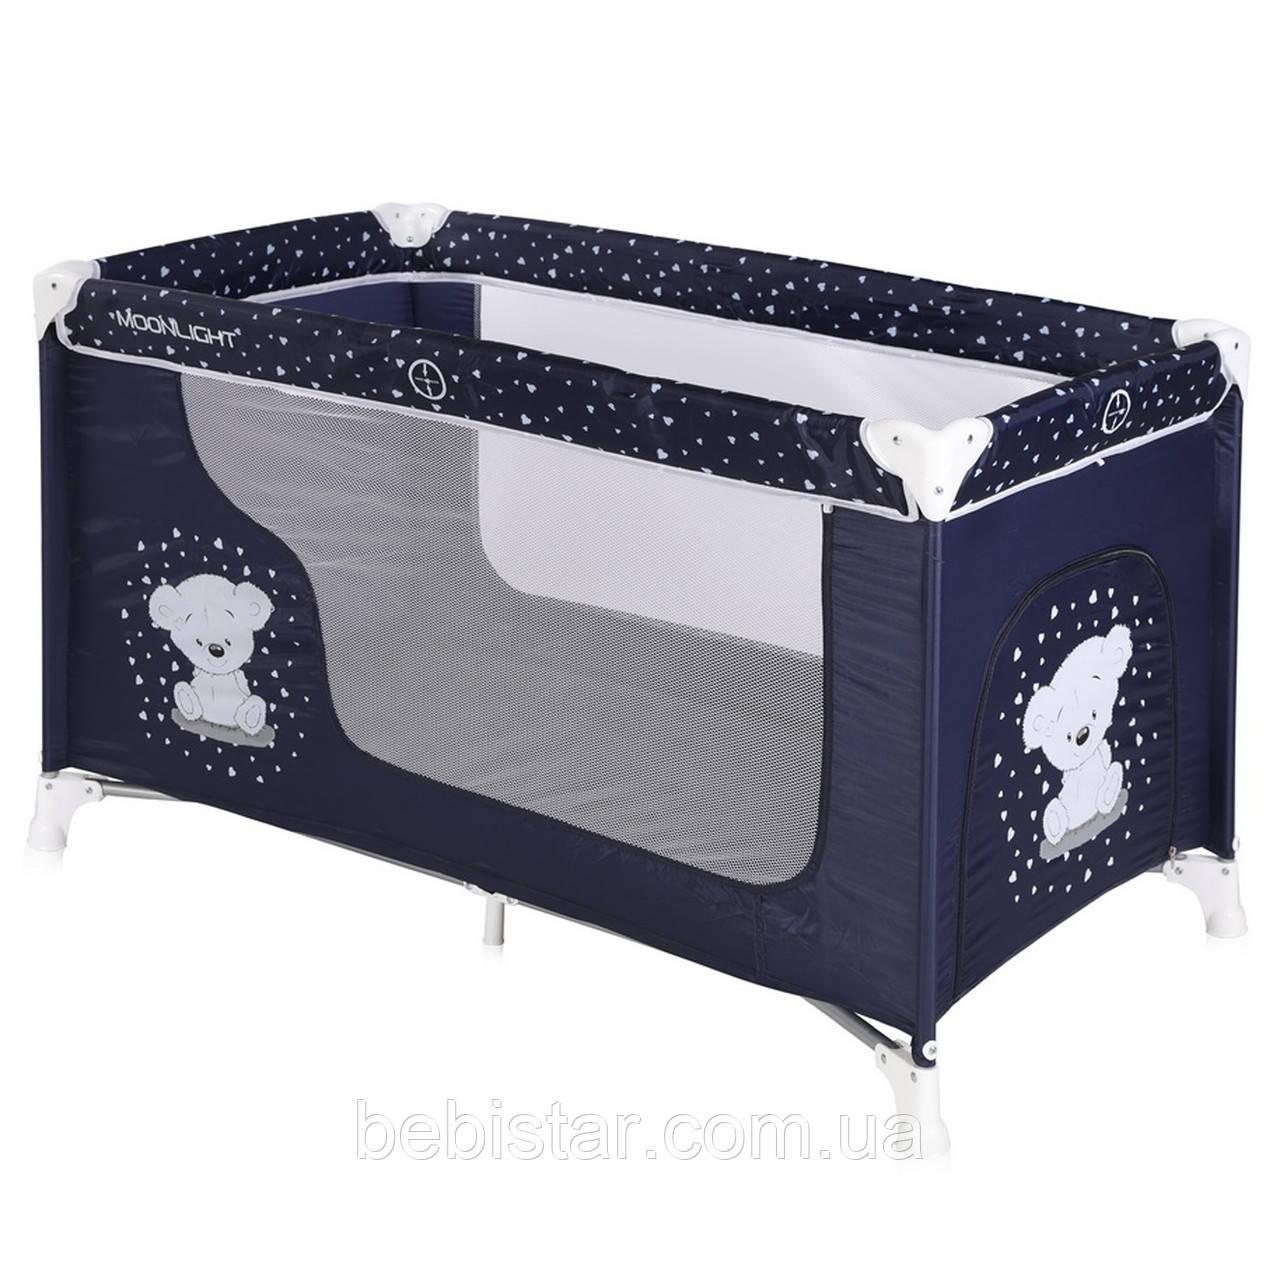 Манеж-кровать синий Lorelli MOONLIGHT 1 Dark blue teddy bear